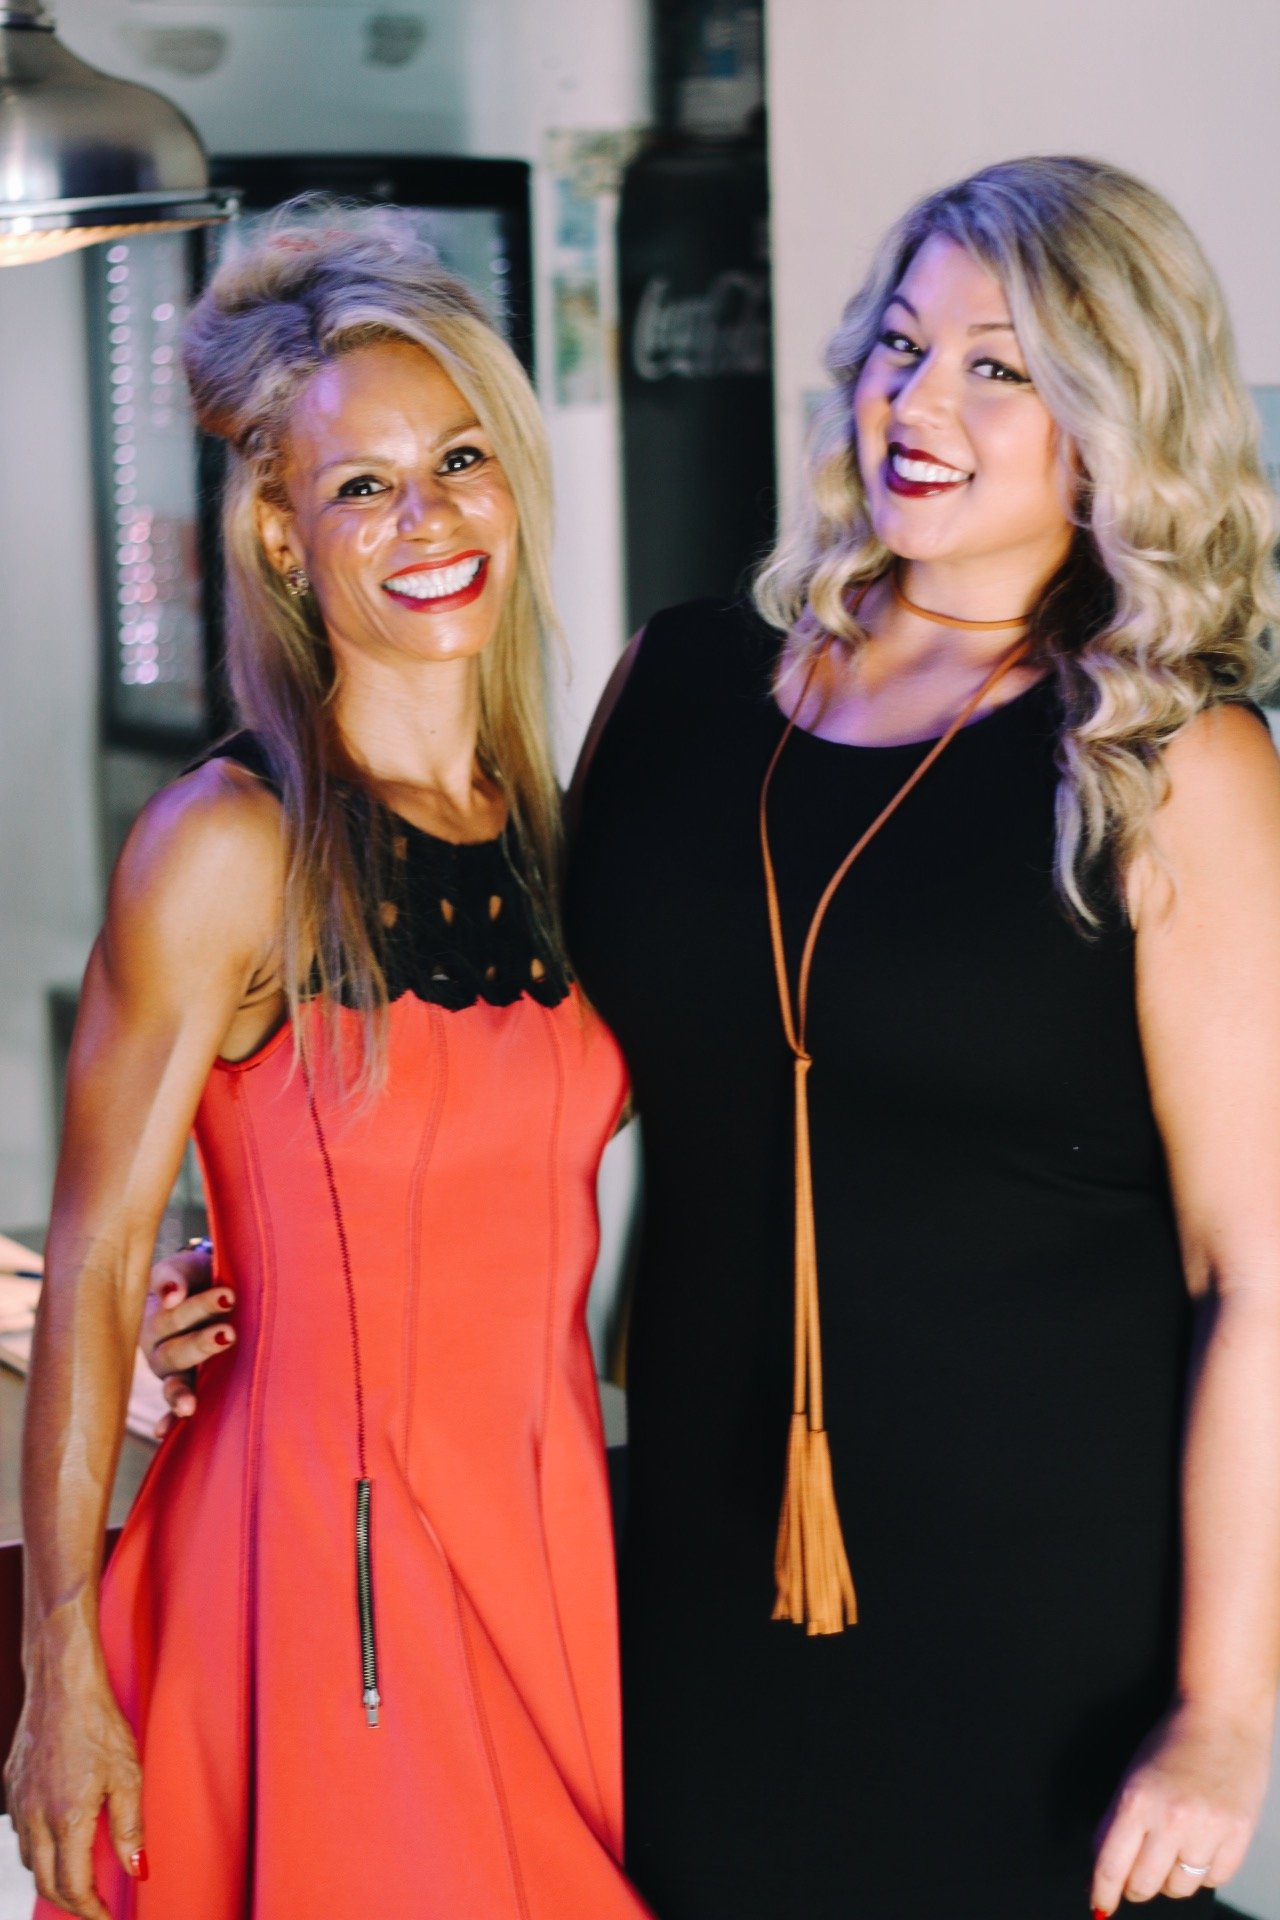 Women Who Wine-Uncorked Conversations-Eat Greek-Miami Wine Events-Wine Tasting Miami-13.jpg